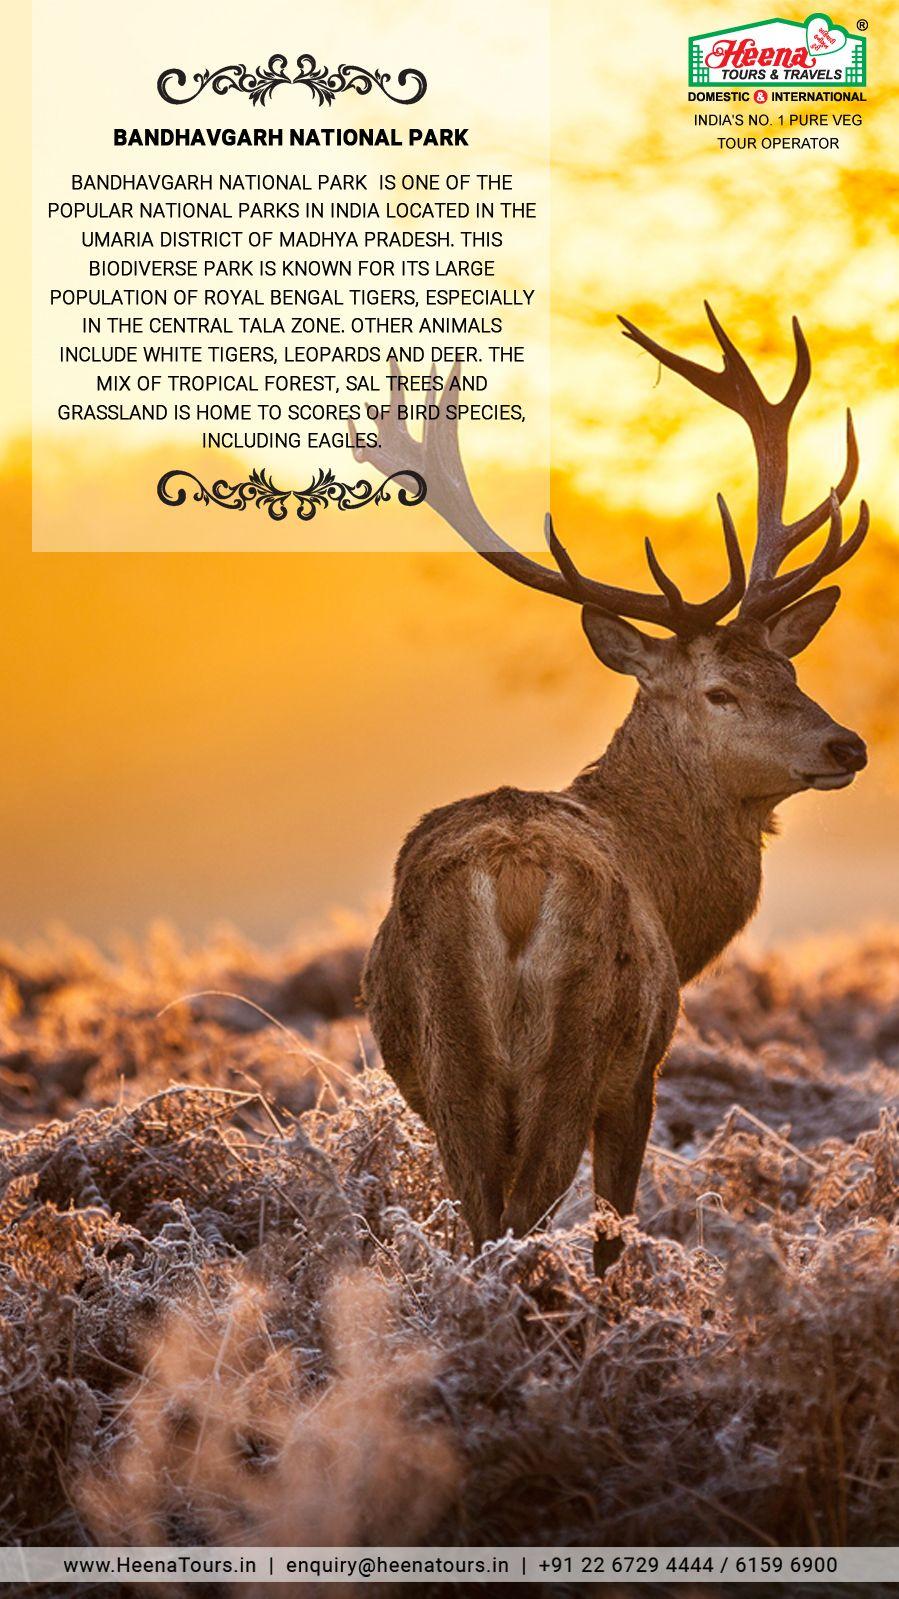 Bandhavgarh national park madhya pradesh bandhavgarh